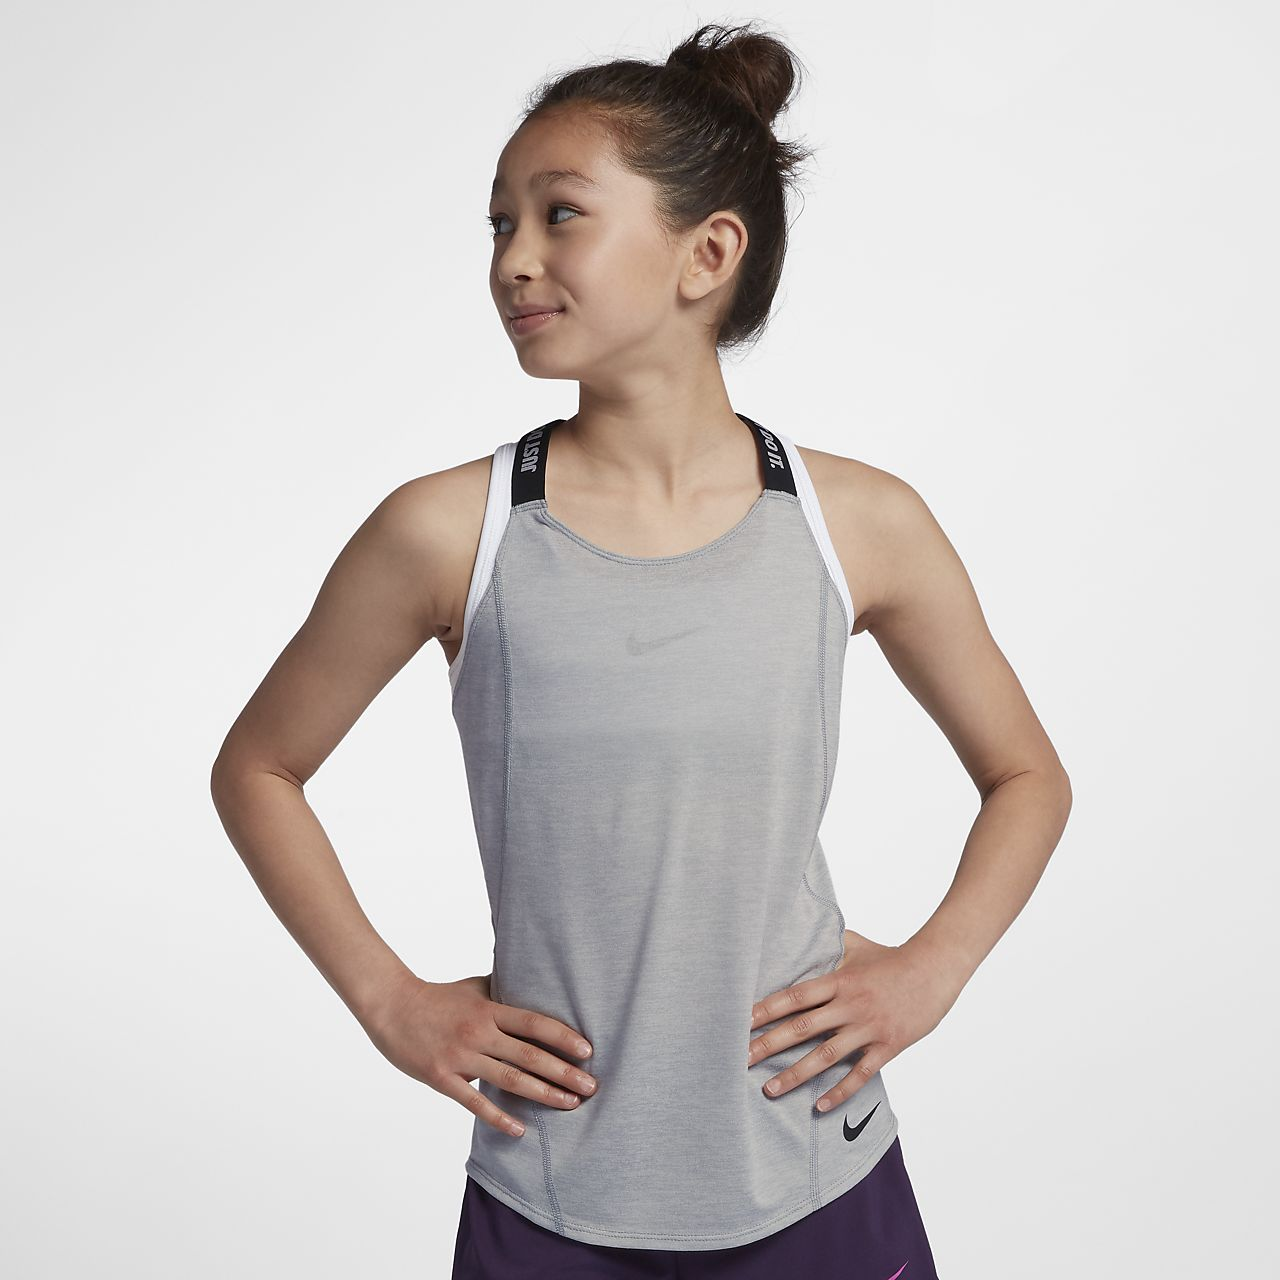 Camiseta de tirantes de entrenamiento para niña talla grande Nike Dri-FIT